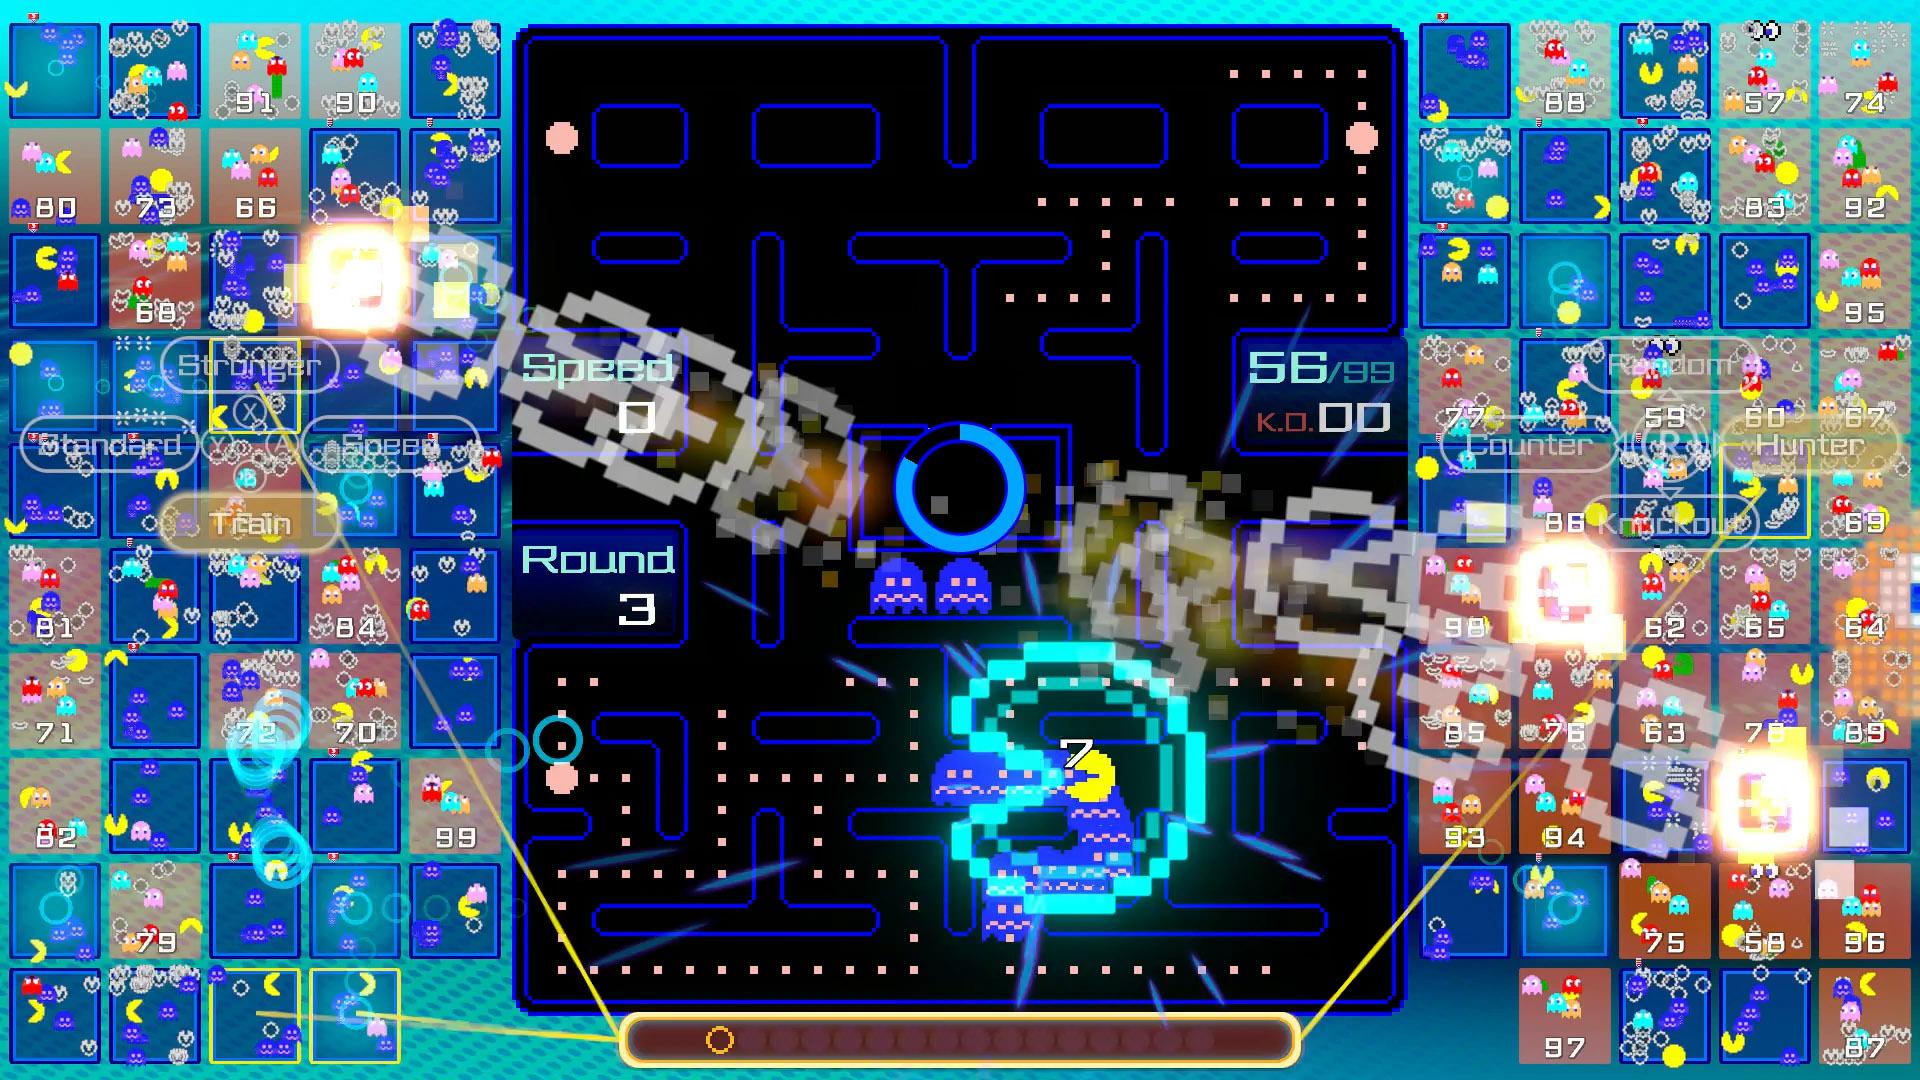 pac-man 99 target players